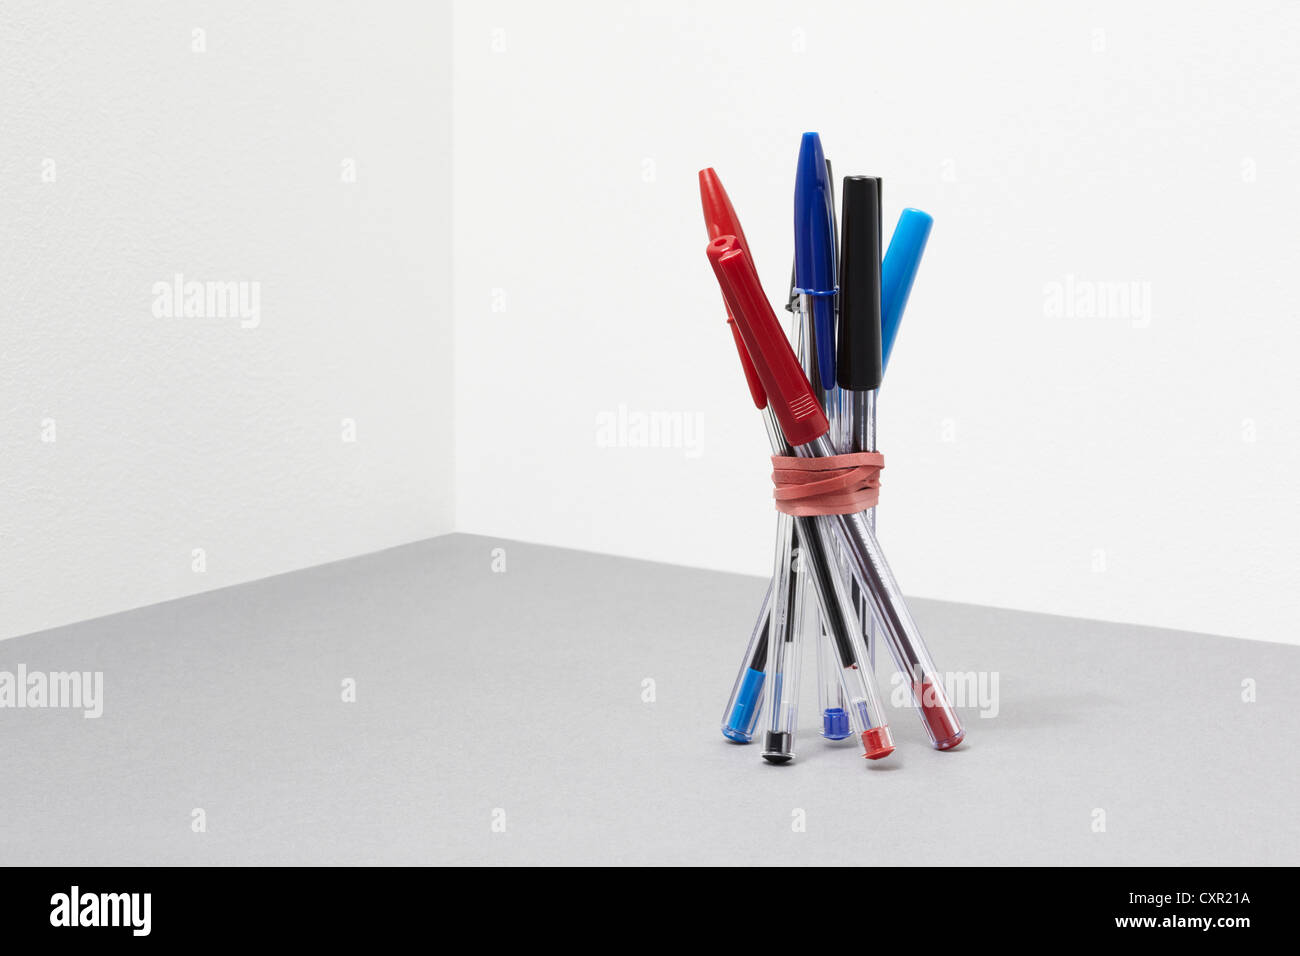 Bundle of pens - Stock Image